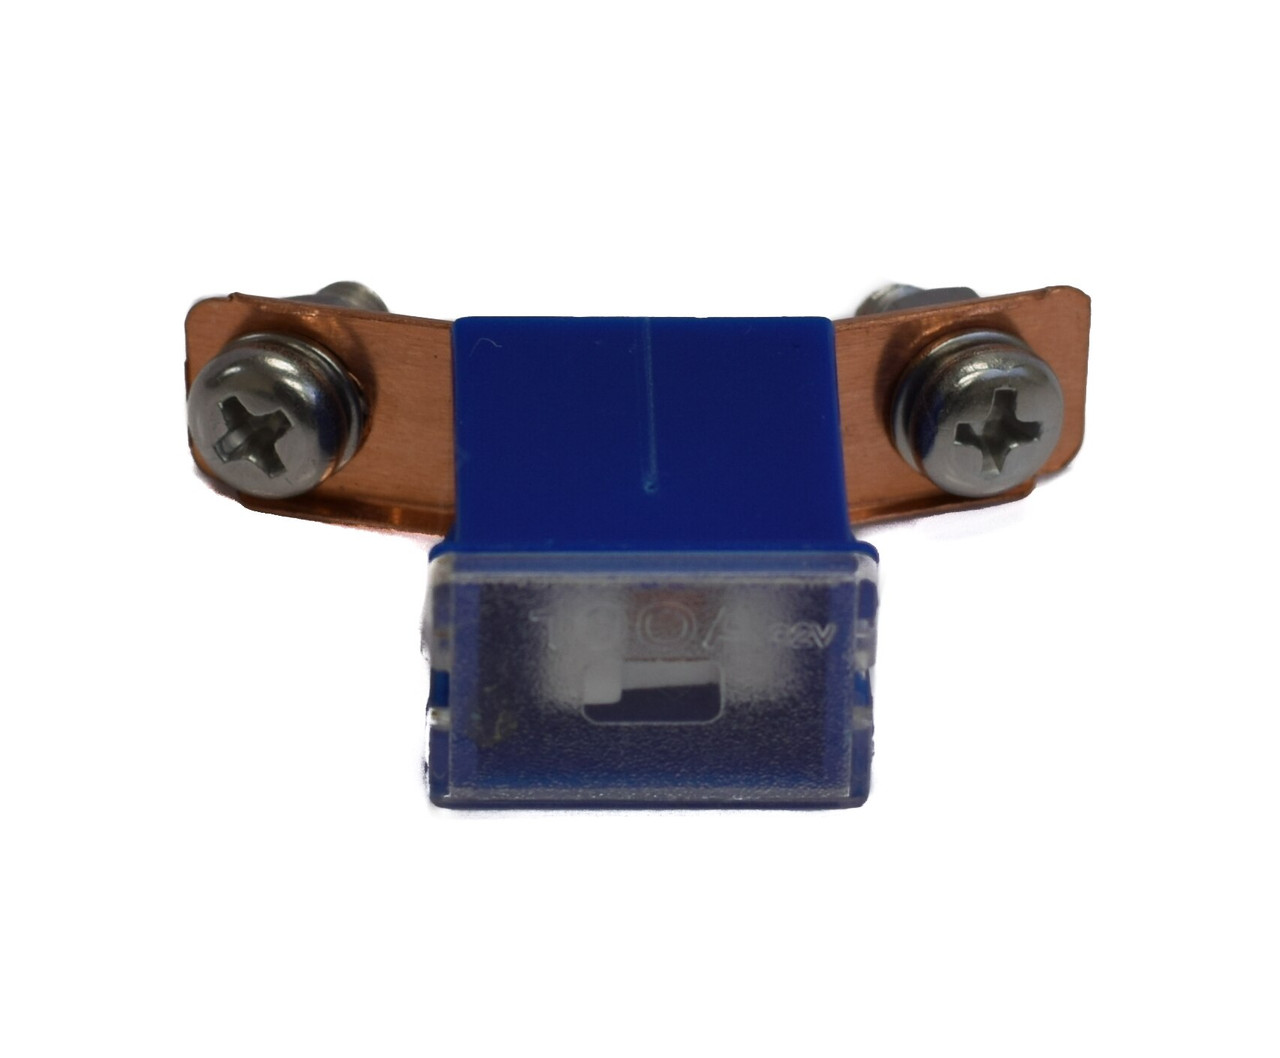 Raion Power RBC7 100A Fuse Includes Nuts & Bolts For APC SmartUPS 1400NET